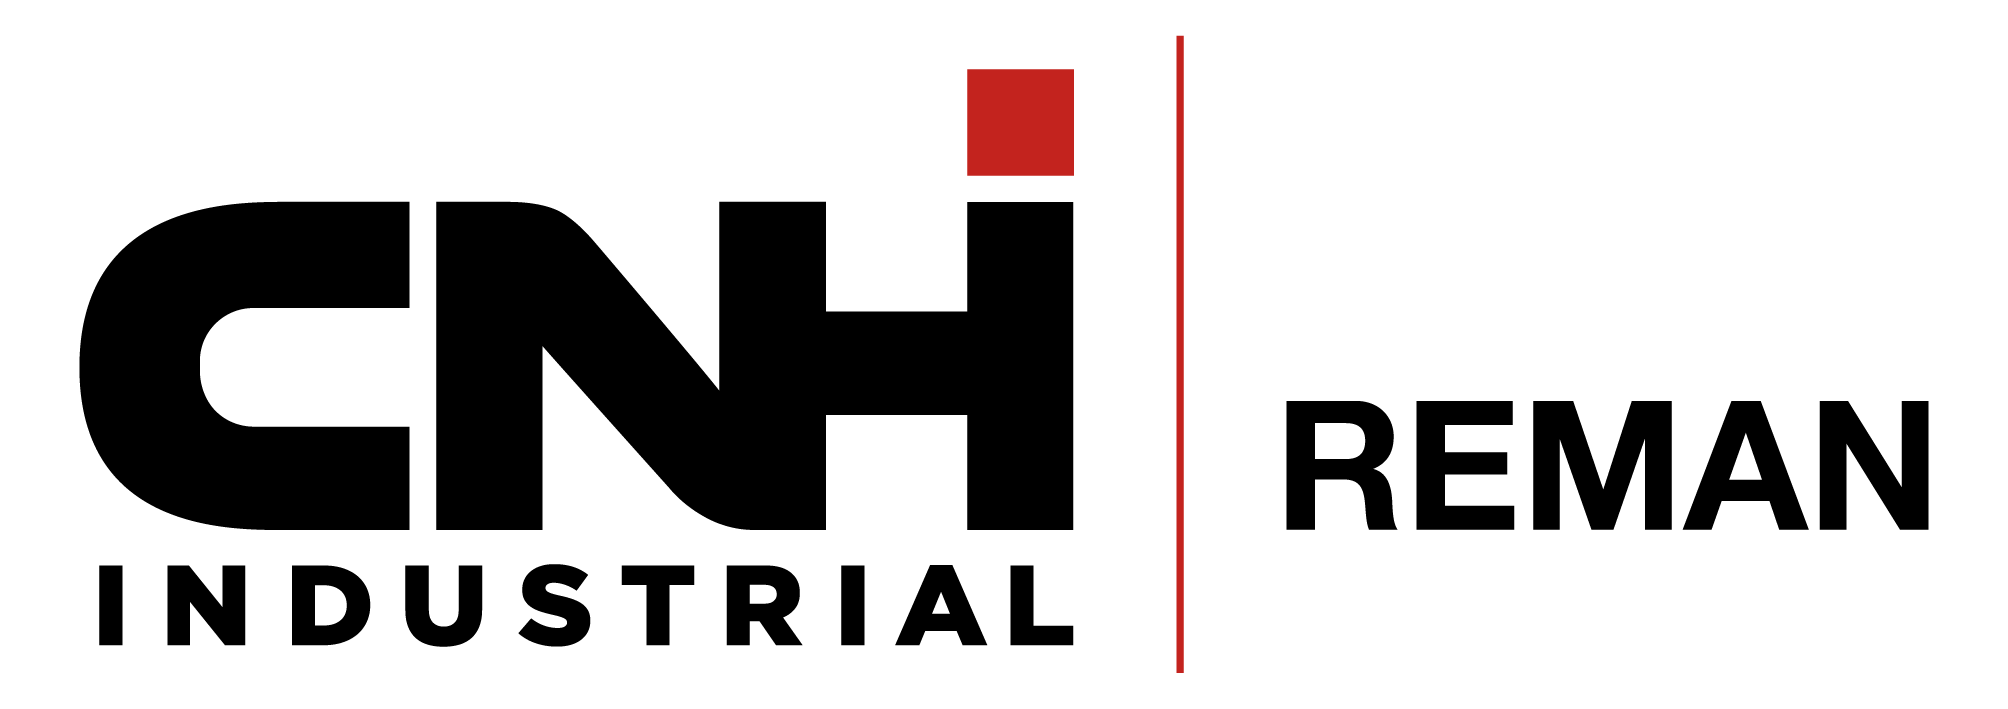 cnhi reman logo.png